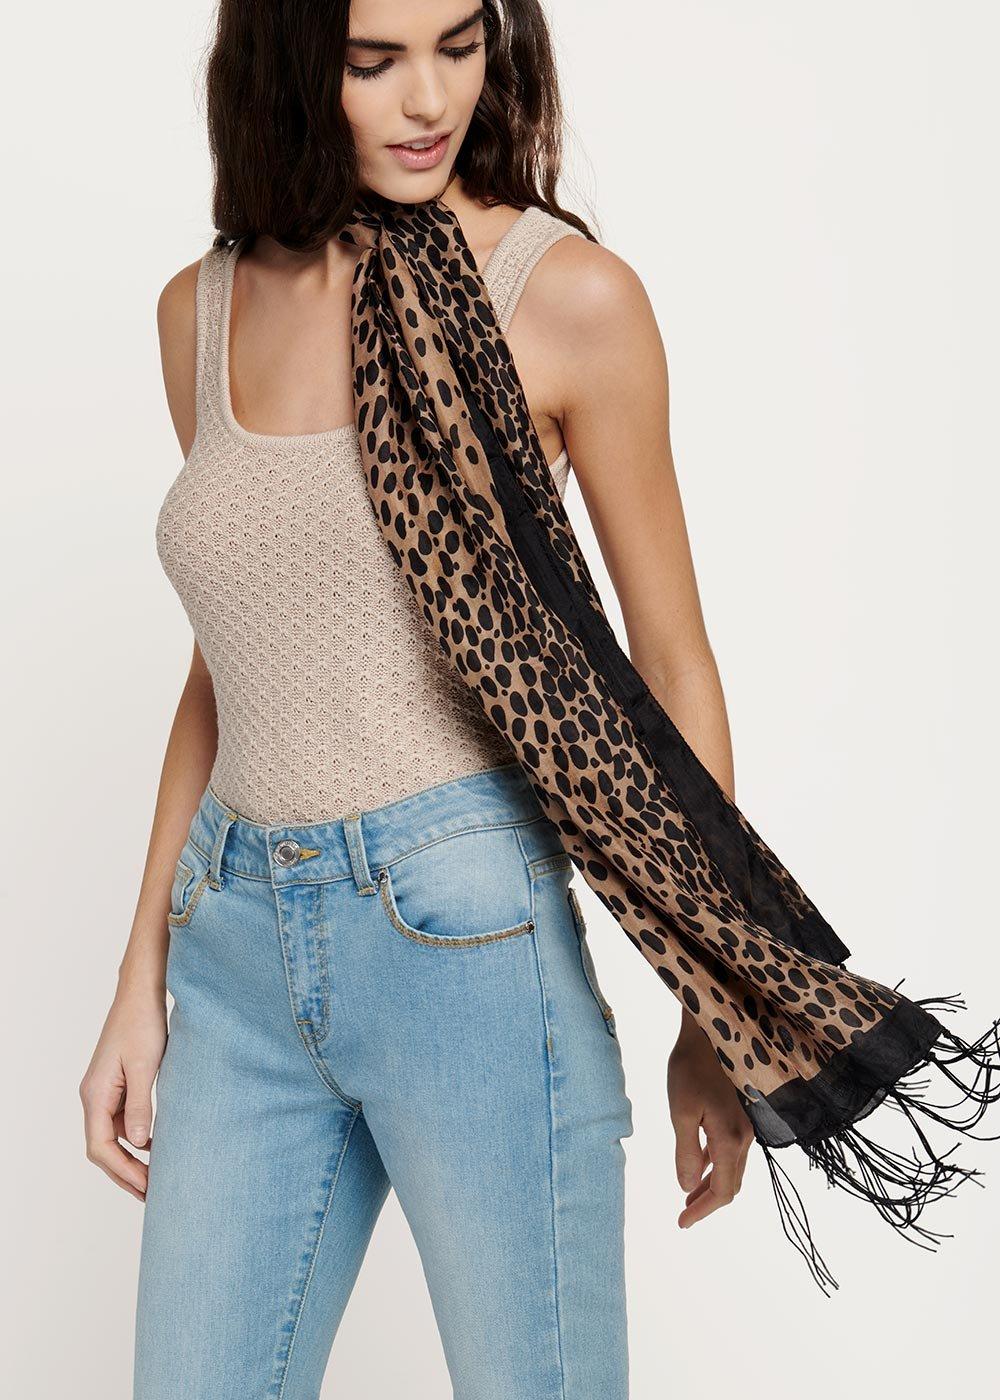 Seraphy animal print scarf with fringes - Doeskin / Black Animalier - Woman